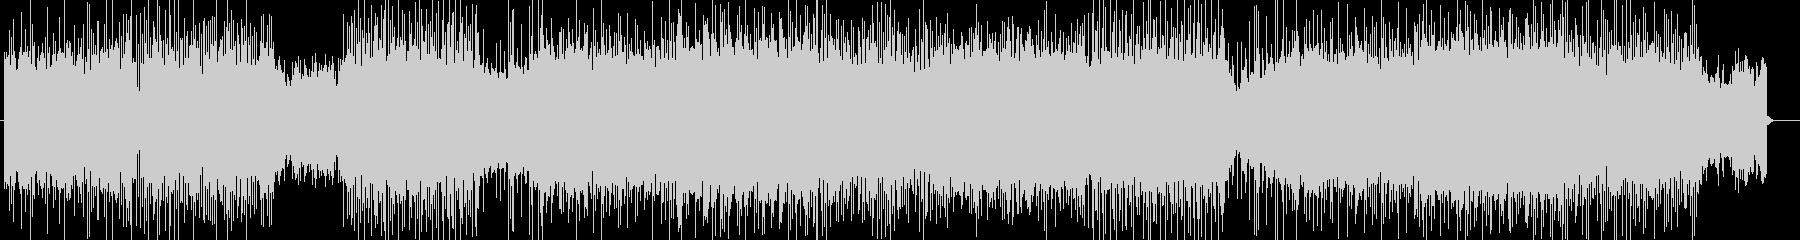 DEATH METAL 勢 BGM152の未再生の波形